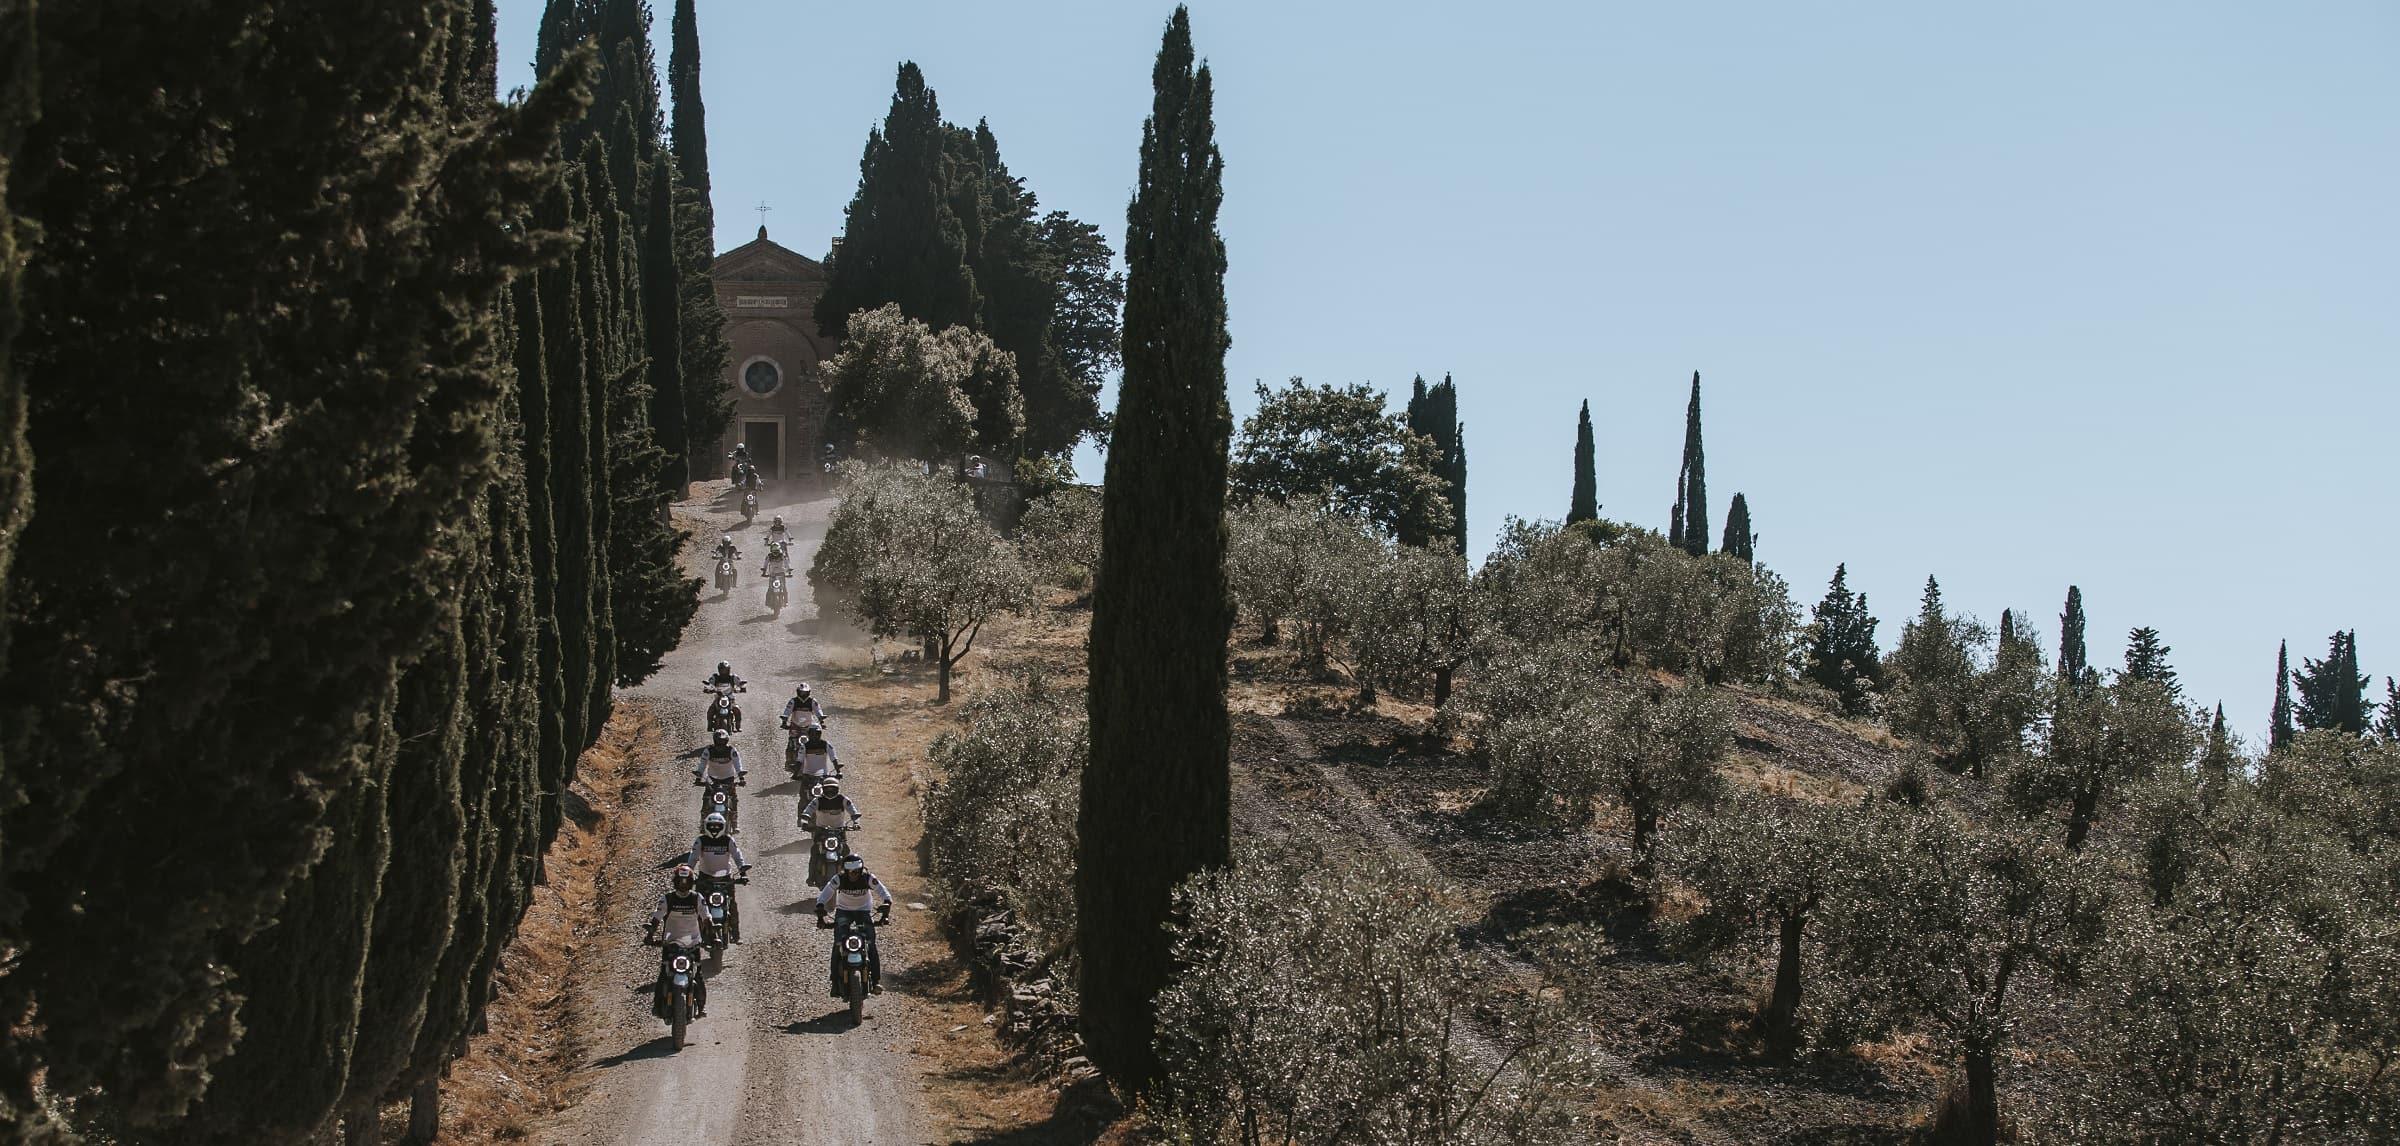 Ducati Scrambler - Days of Joy - Μοτοσυκλετιστές με Ducati στην Τοσκάνη